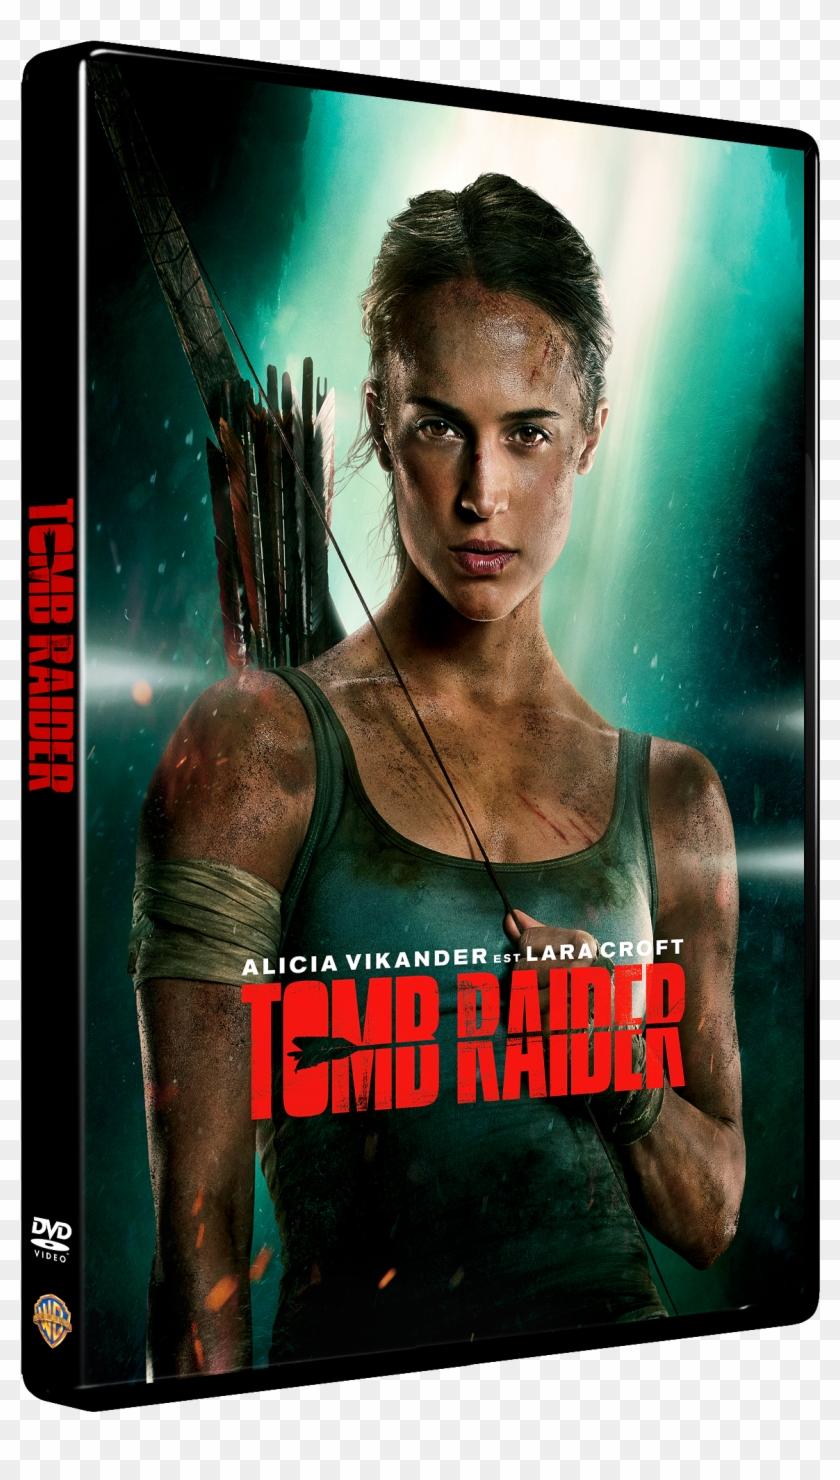 tomb raider movie 2018 streaming